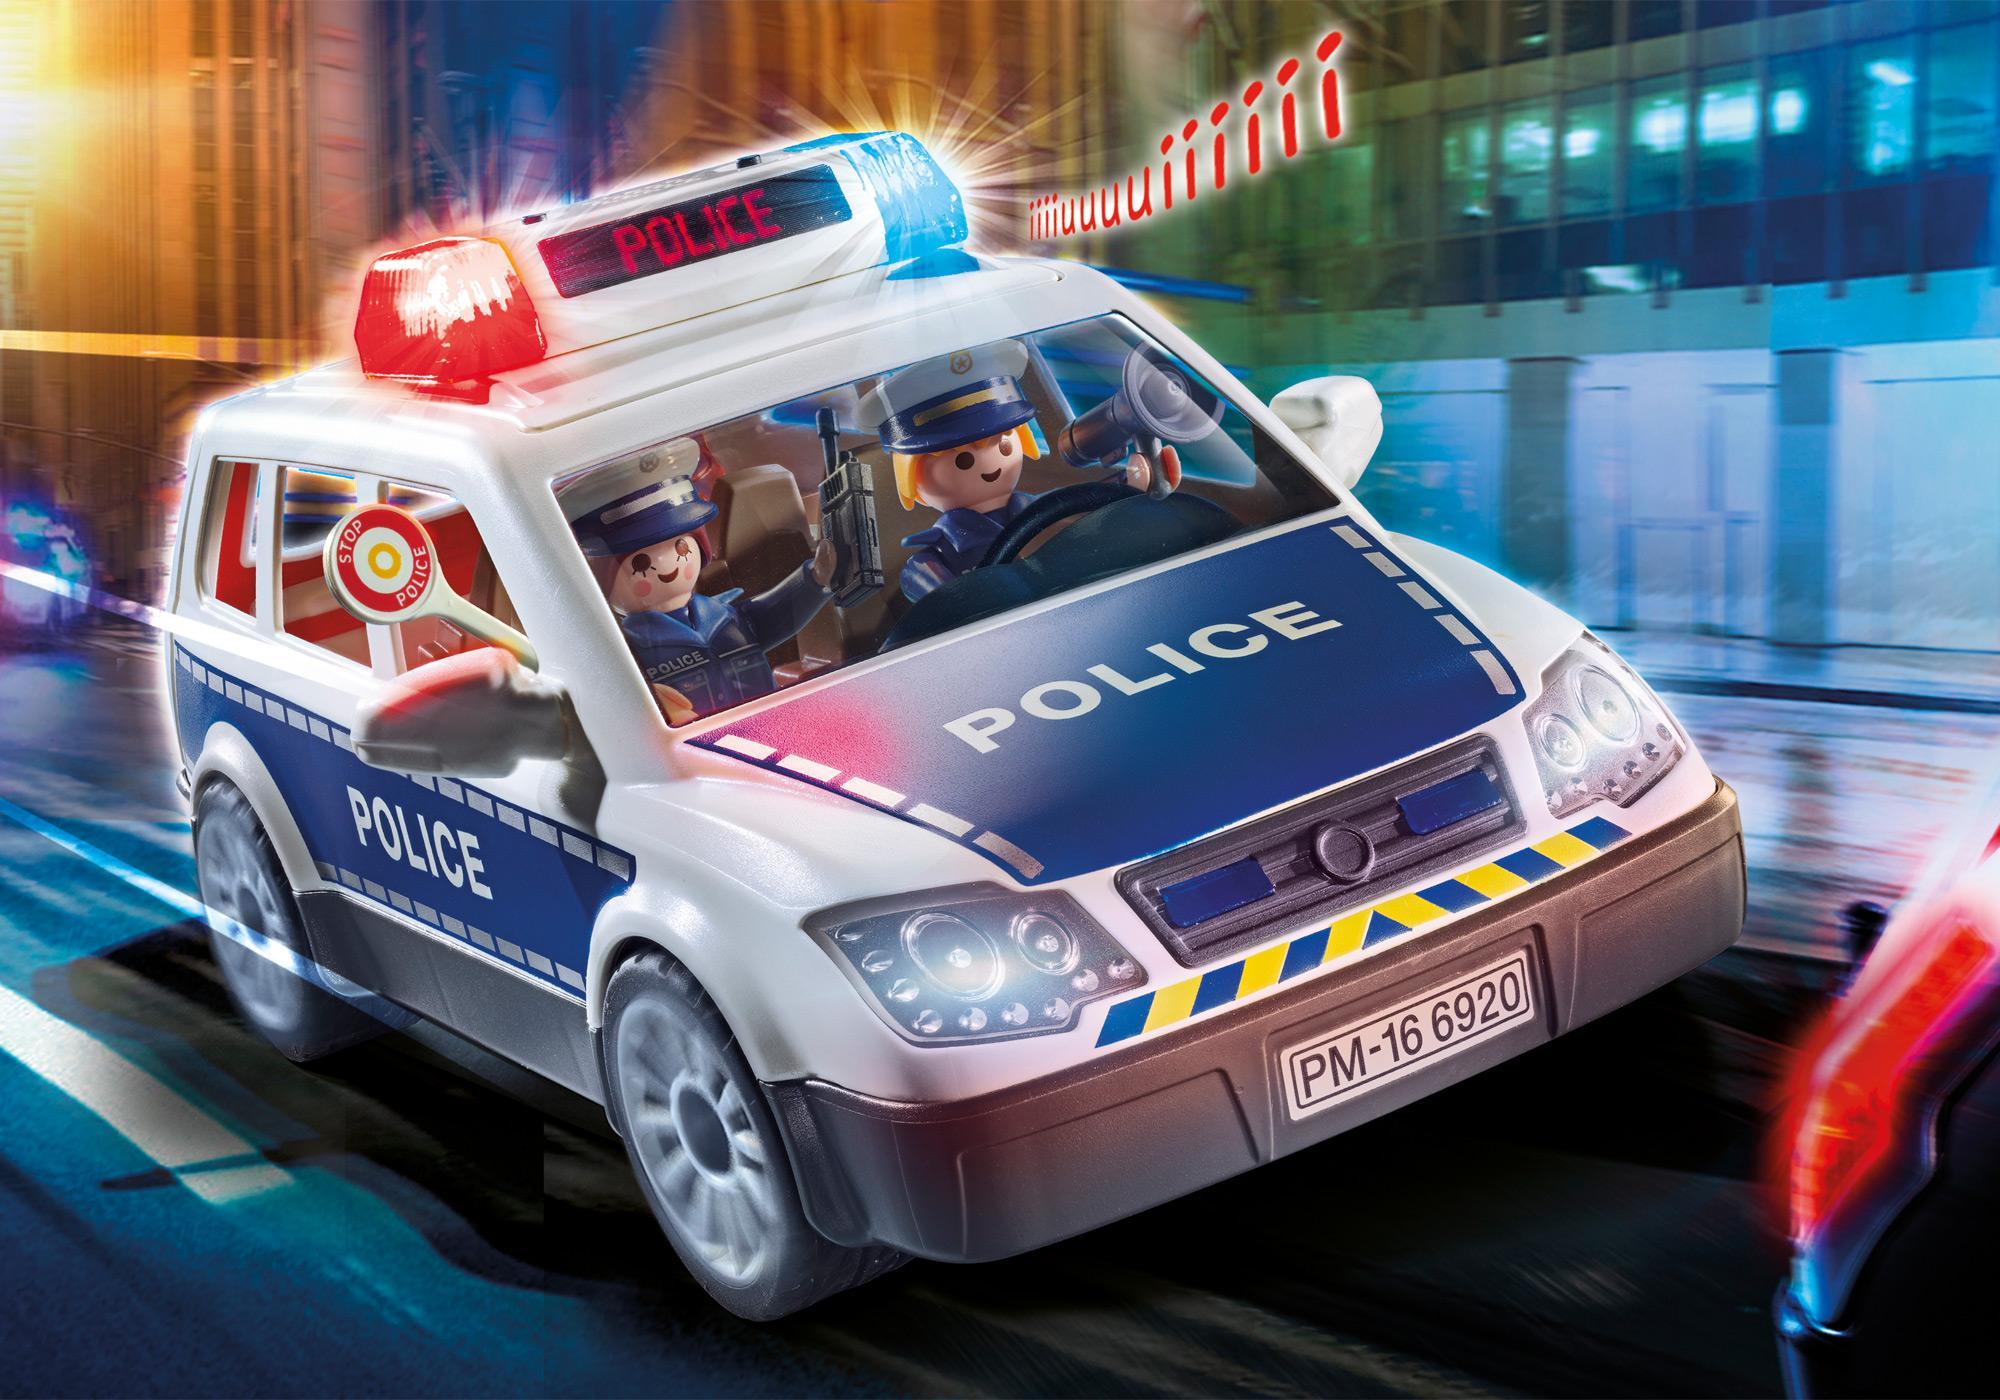 6920_product_detail/Περιπολικό όχημα με φάρο και σειρήνα